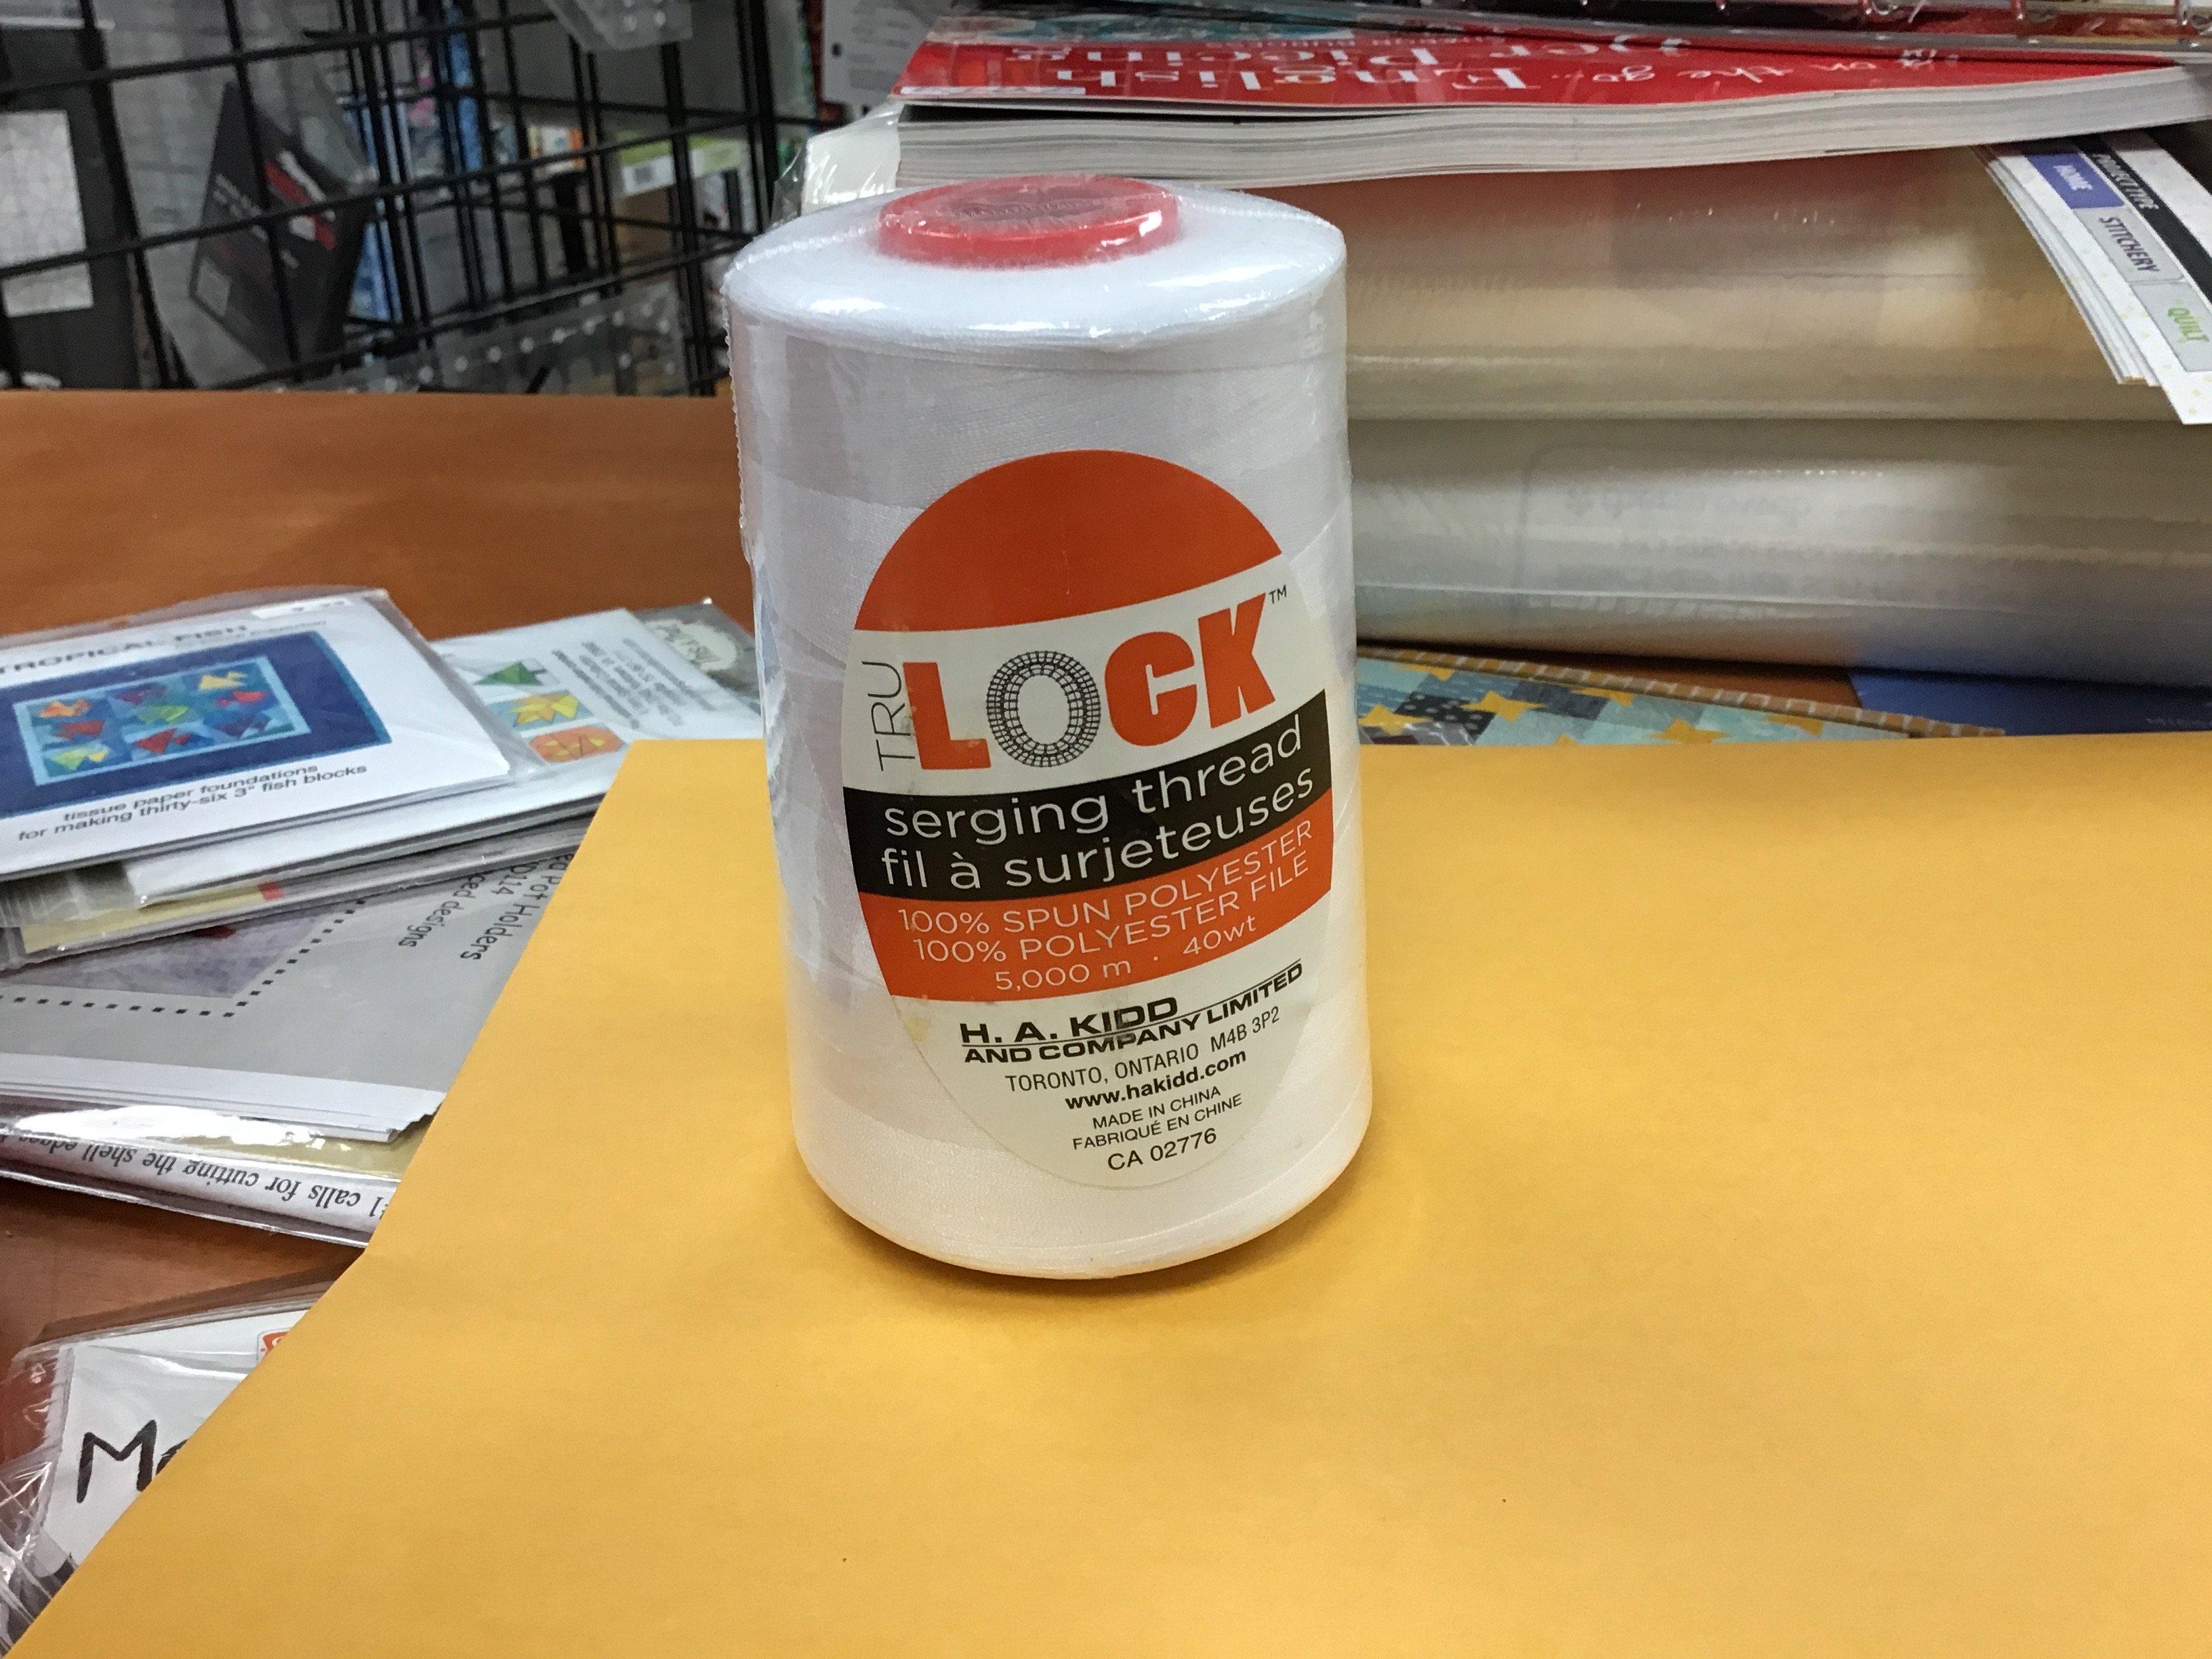 TRU Lock serging Thread